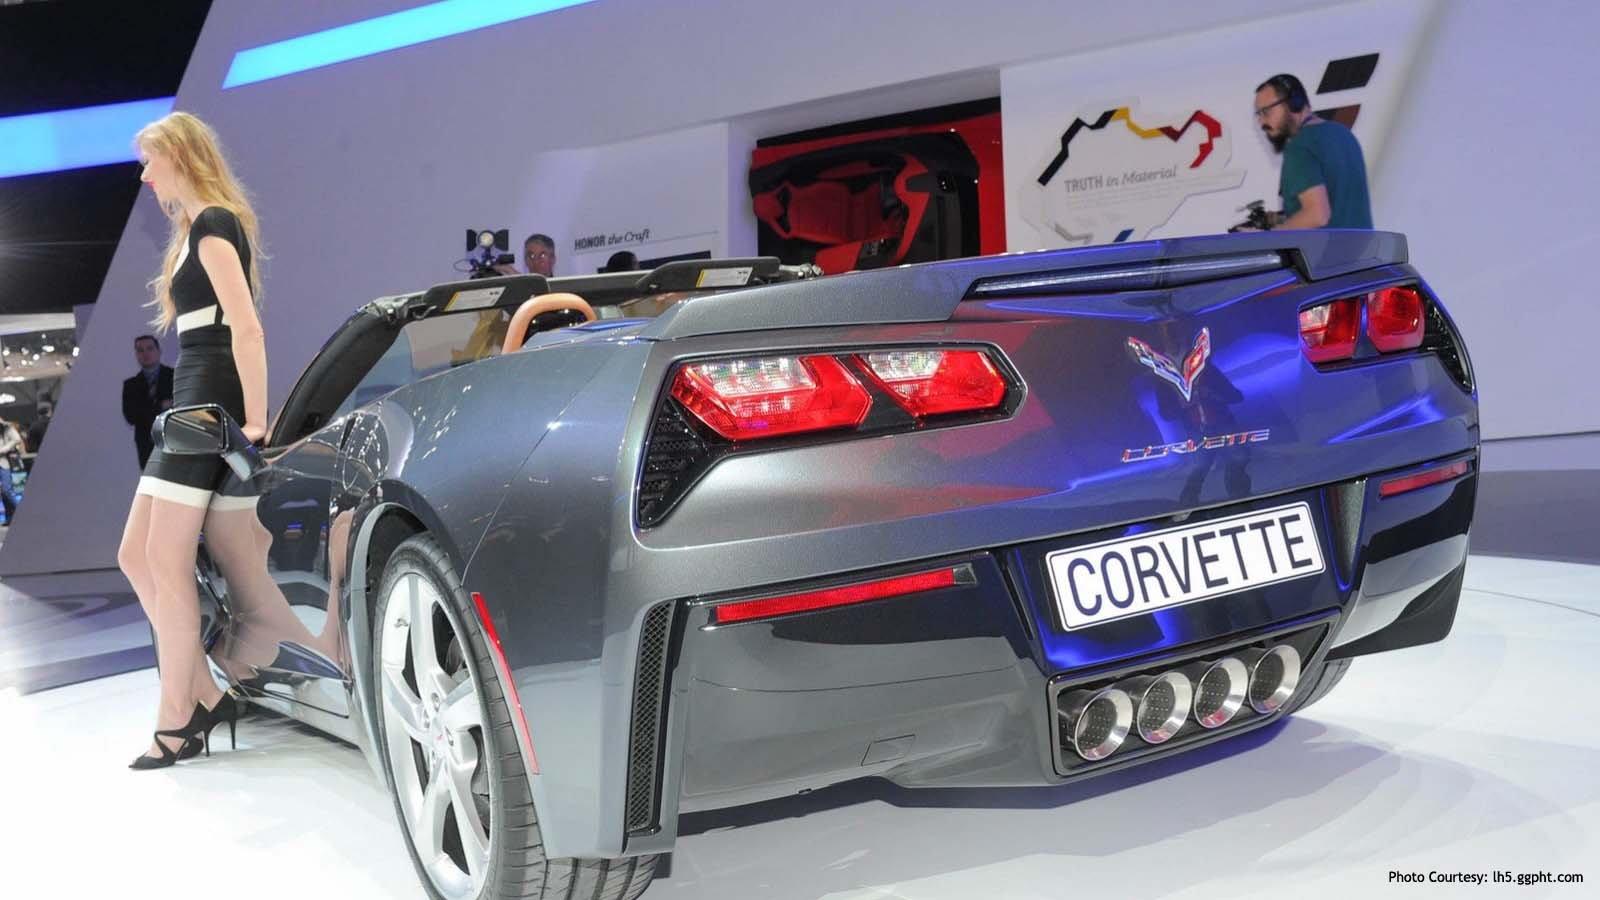 Corvette Curves